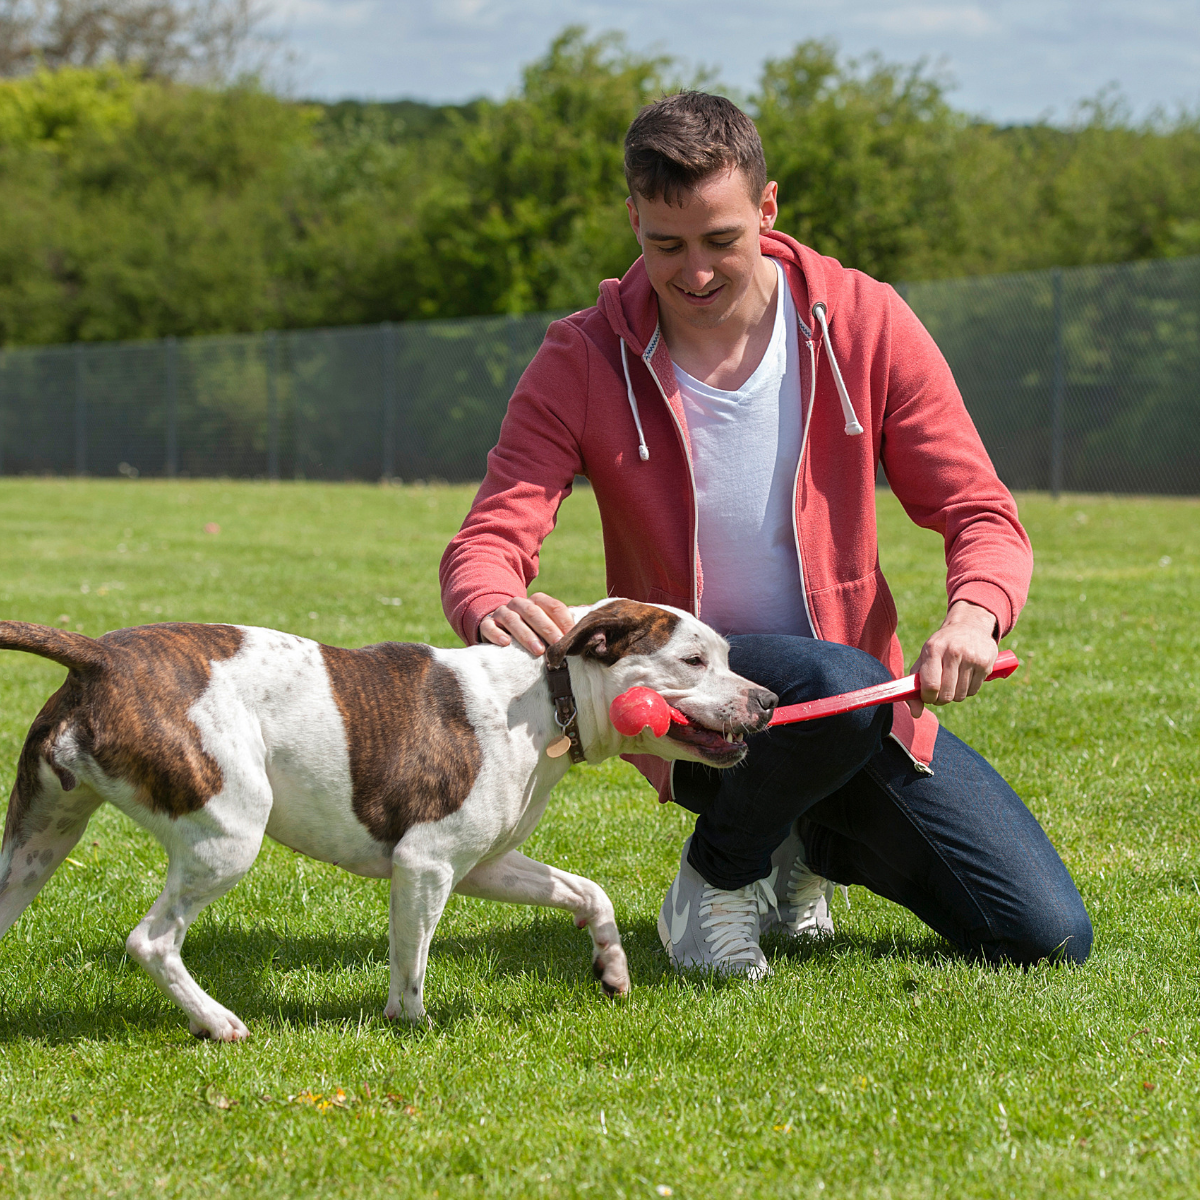 Young man volunteering at dog sanctuary